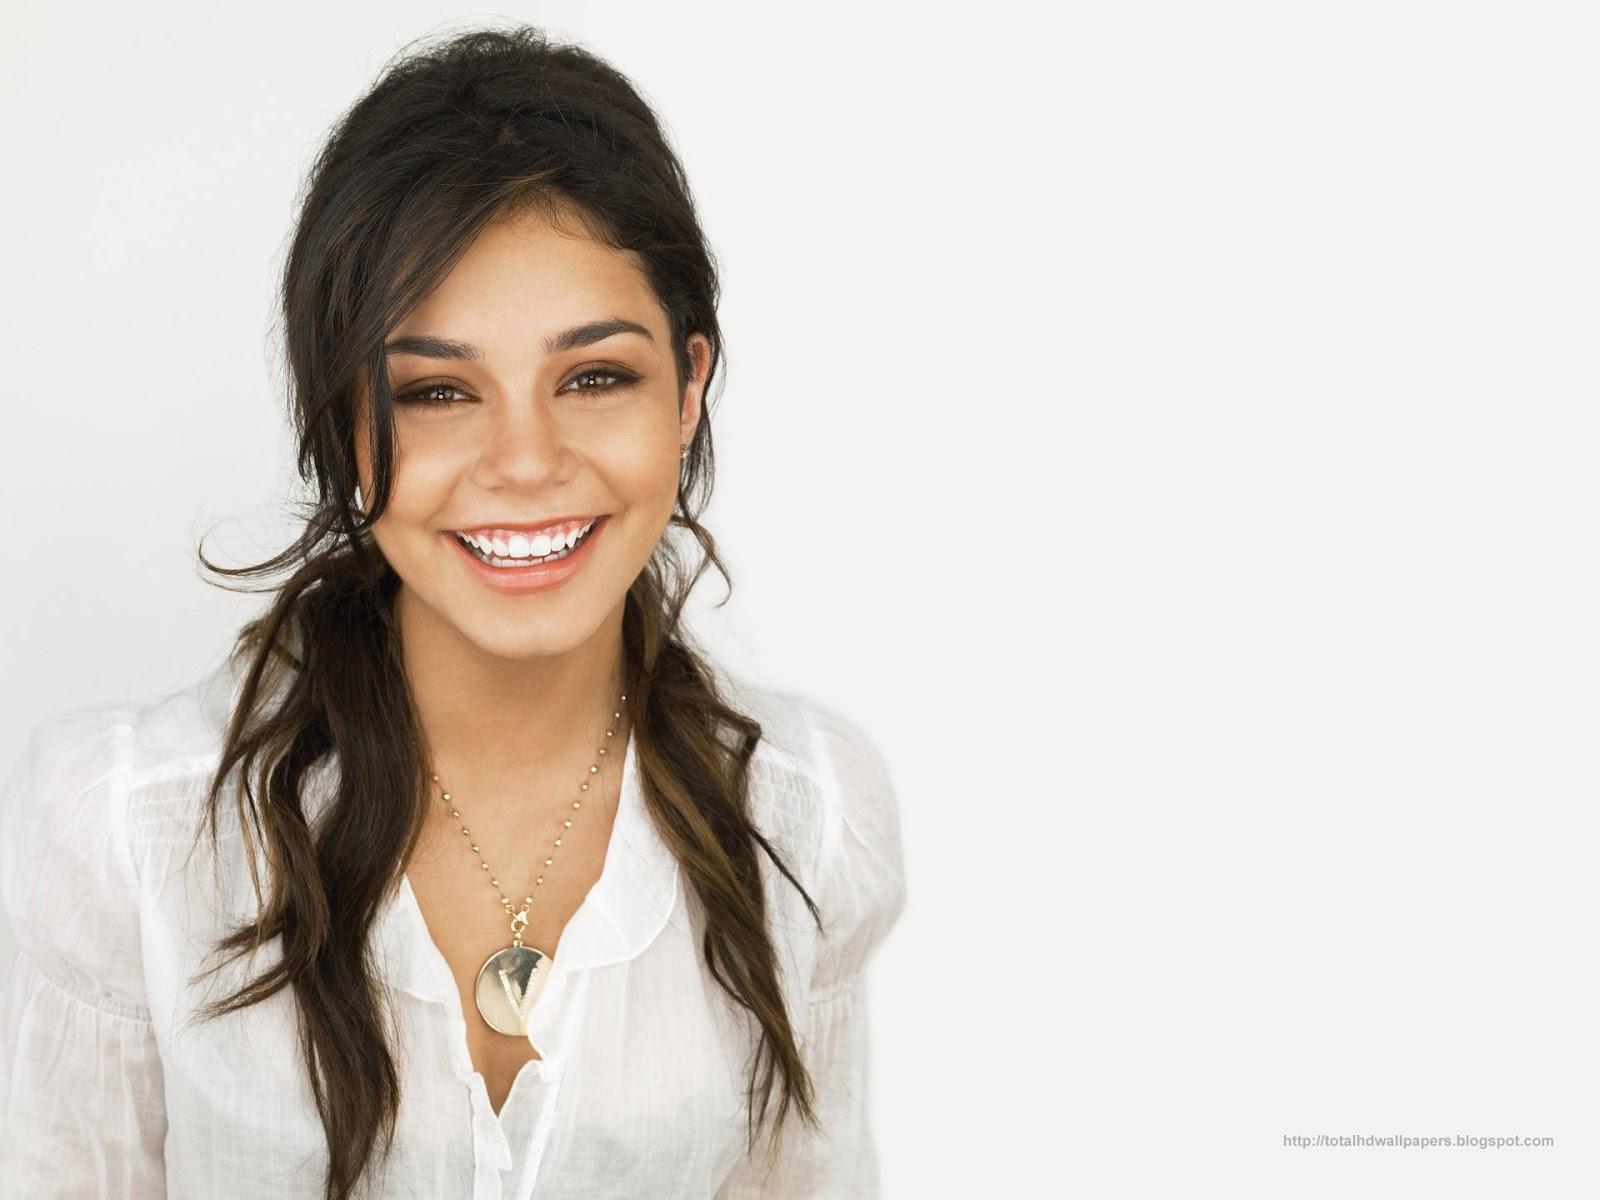 Vanessa Hudgens Smiling Picture